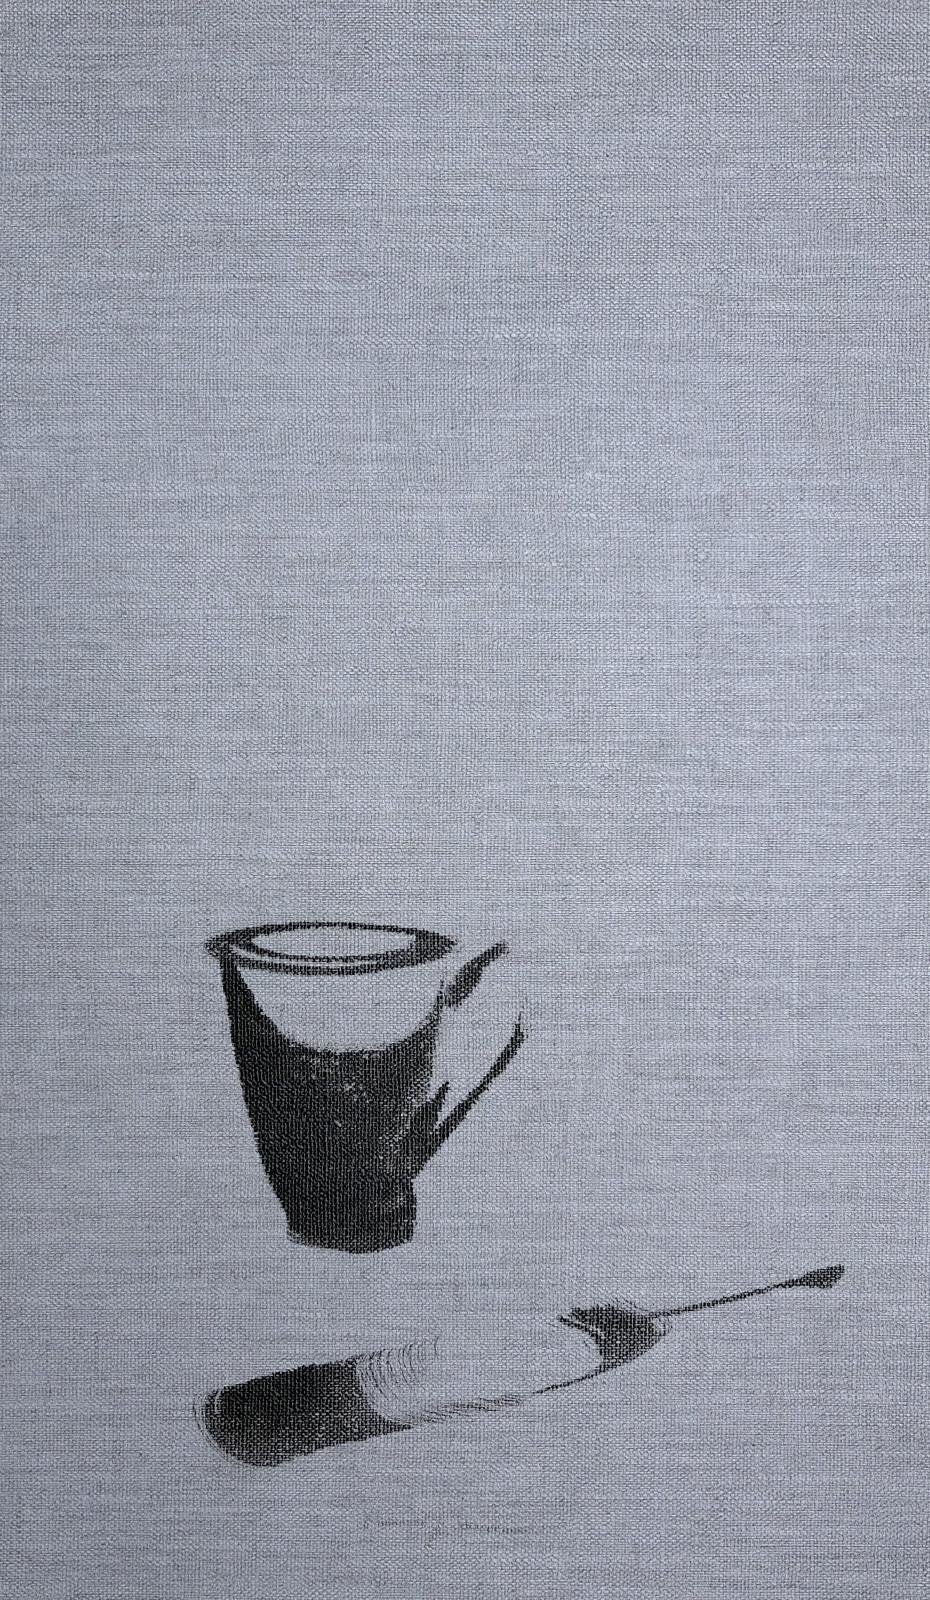 Koetzier van Hooff   Wallpaper Series   Still Life